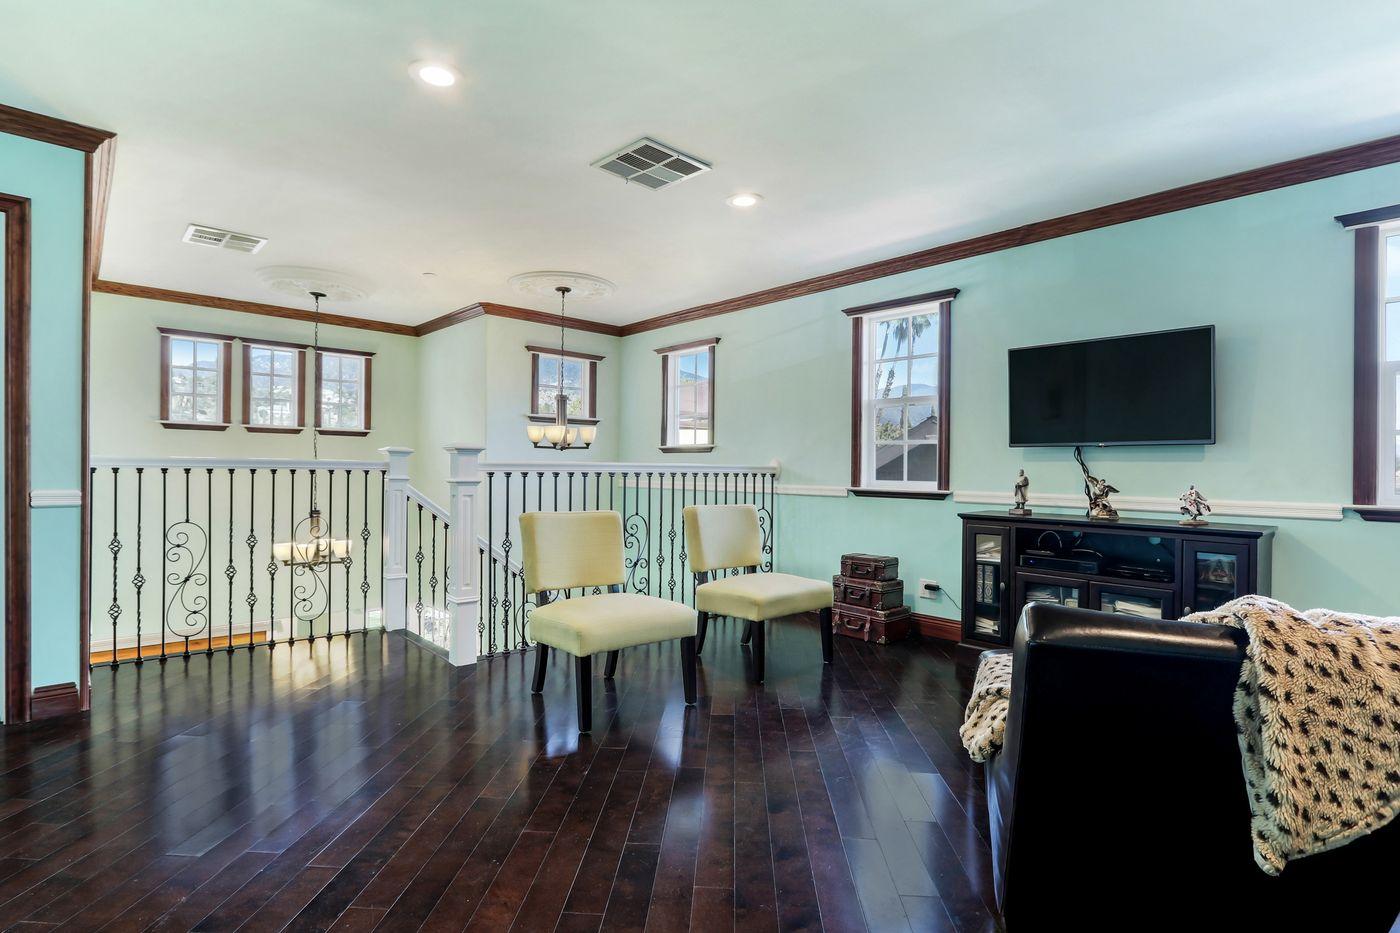 real-estate-photography-los-angeles-pasadena-glendale-burbank-AD-photographer-16